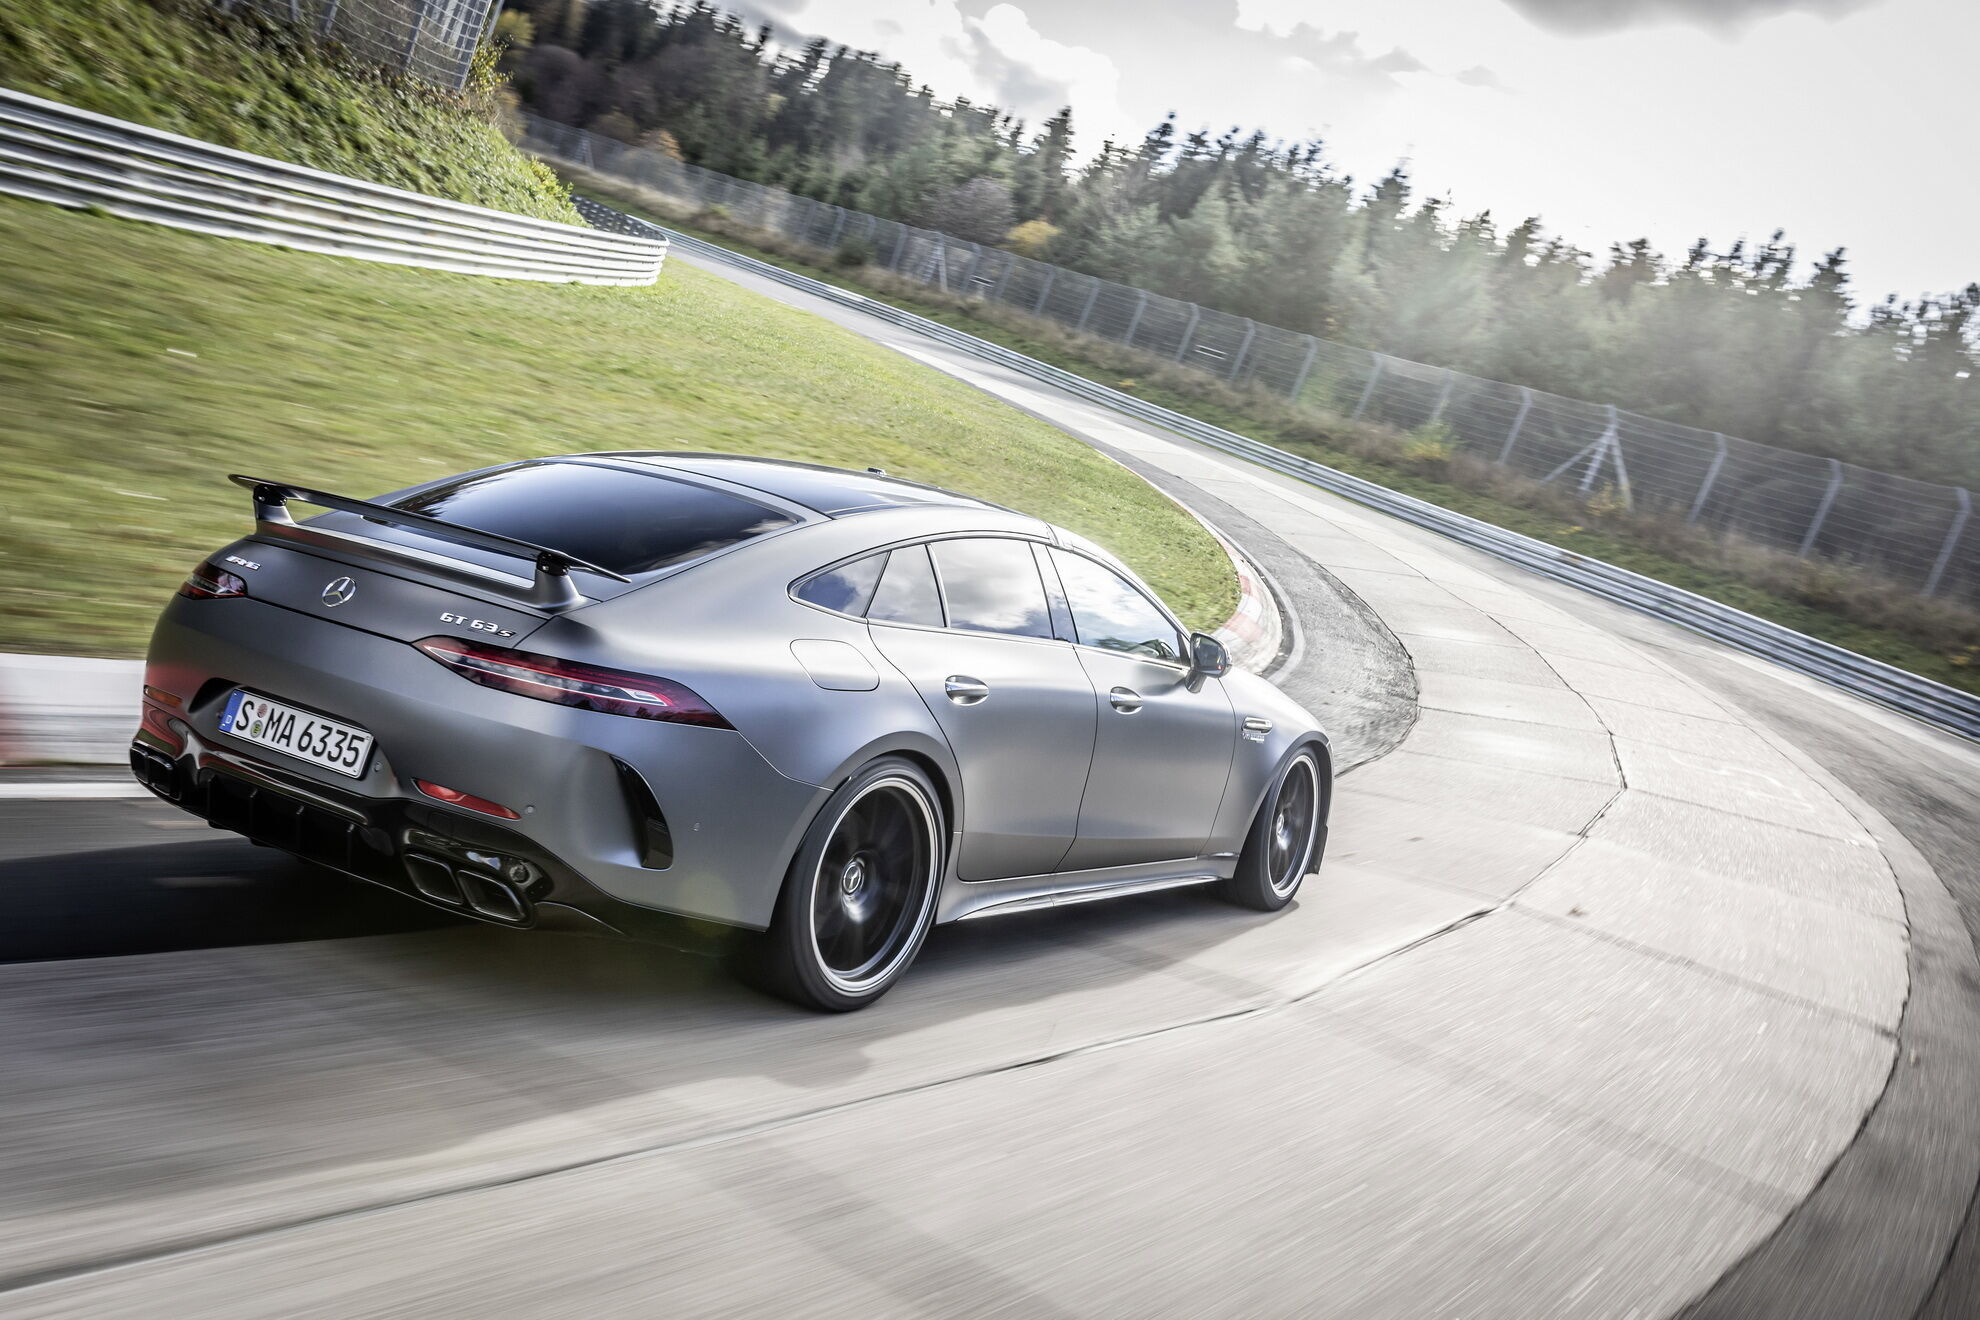 2020 Mercedes-AMG GT 63 S 4Matic+